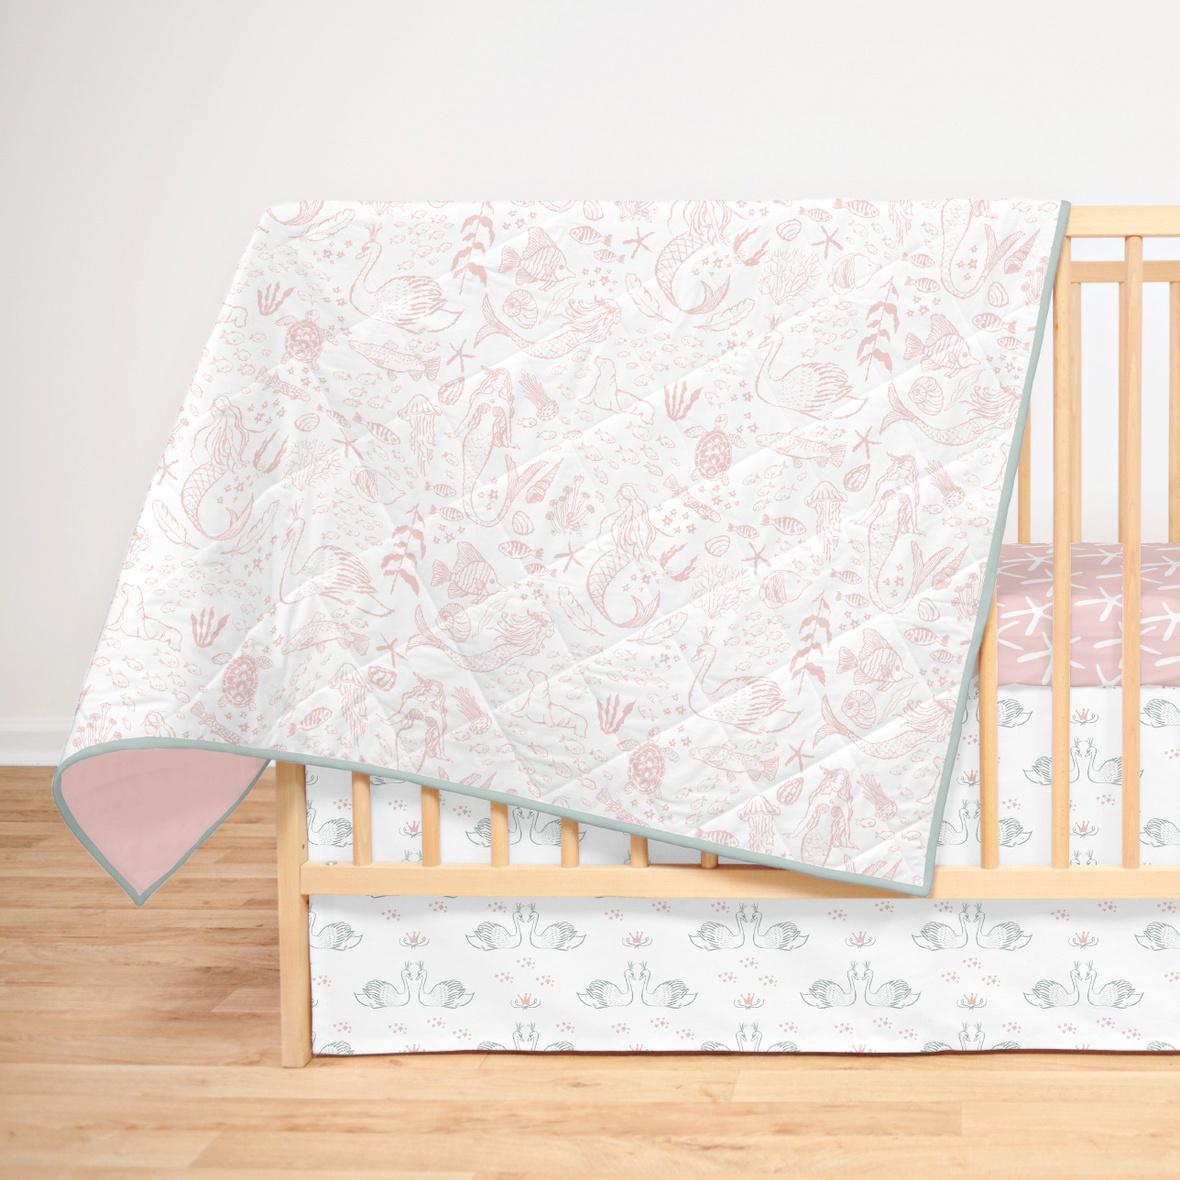 Full Crib Mapping blush mermaids